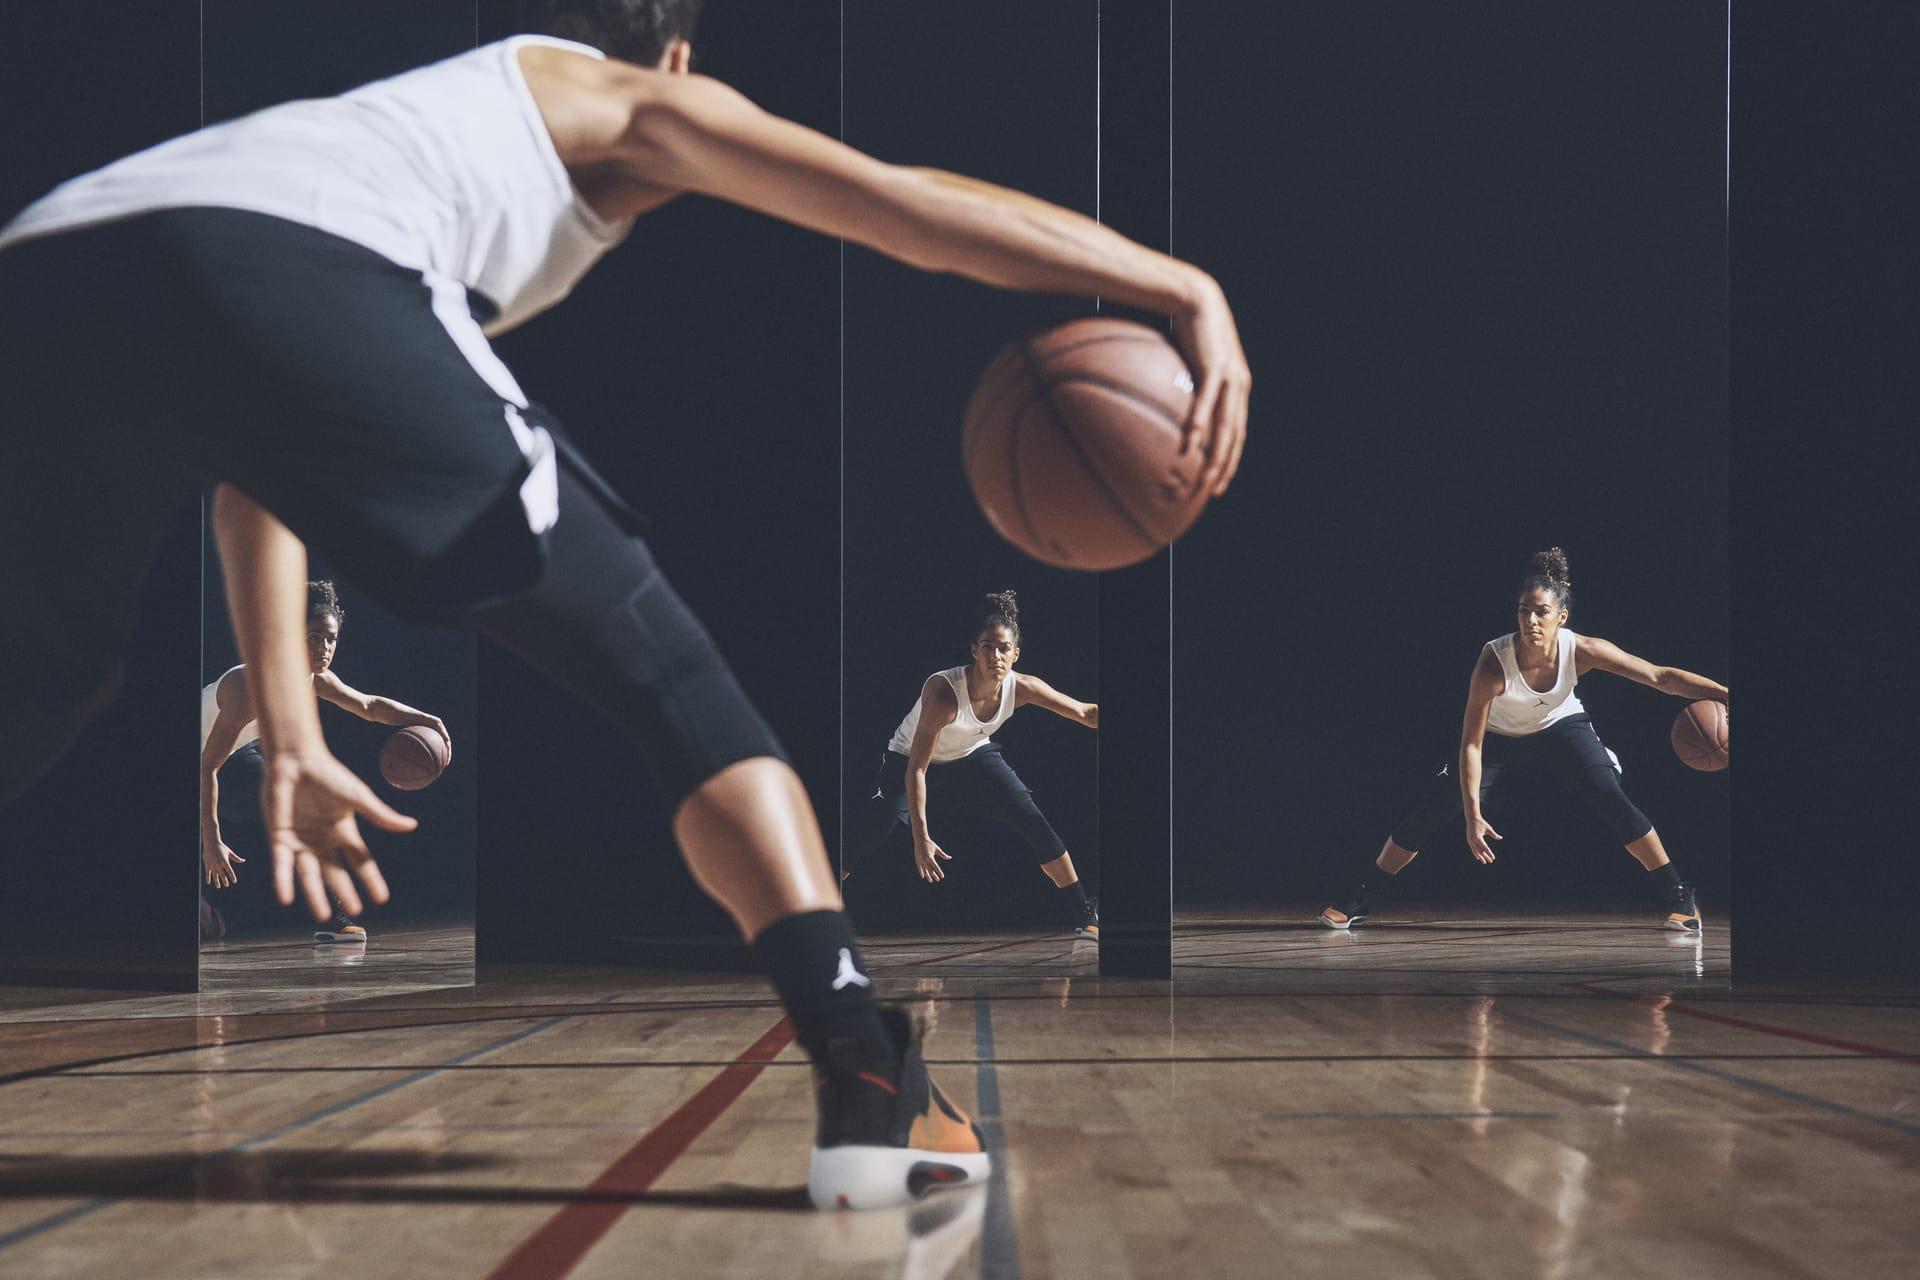 What Is Nike's Reuse-A-Shoe Program? | Nike Help